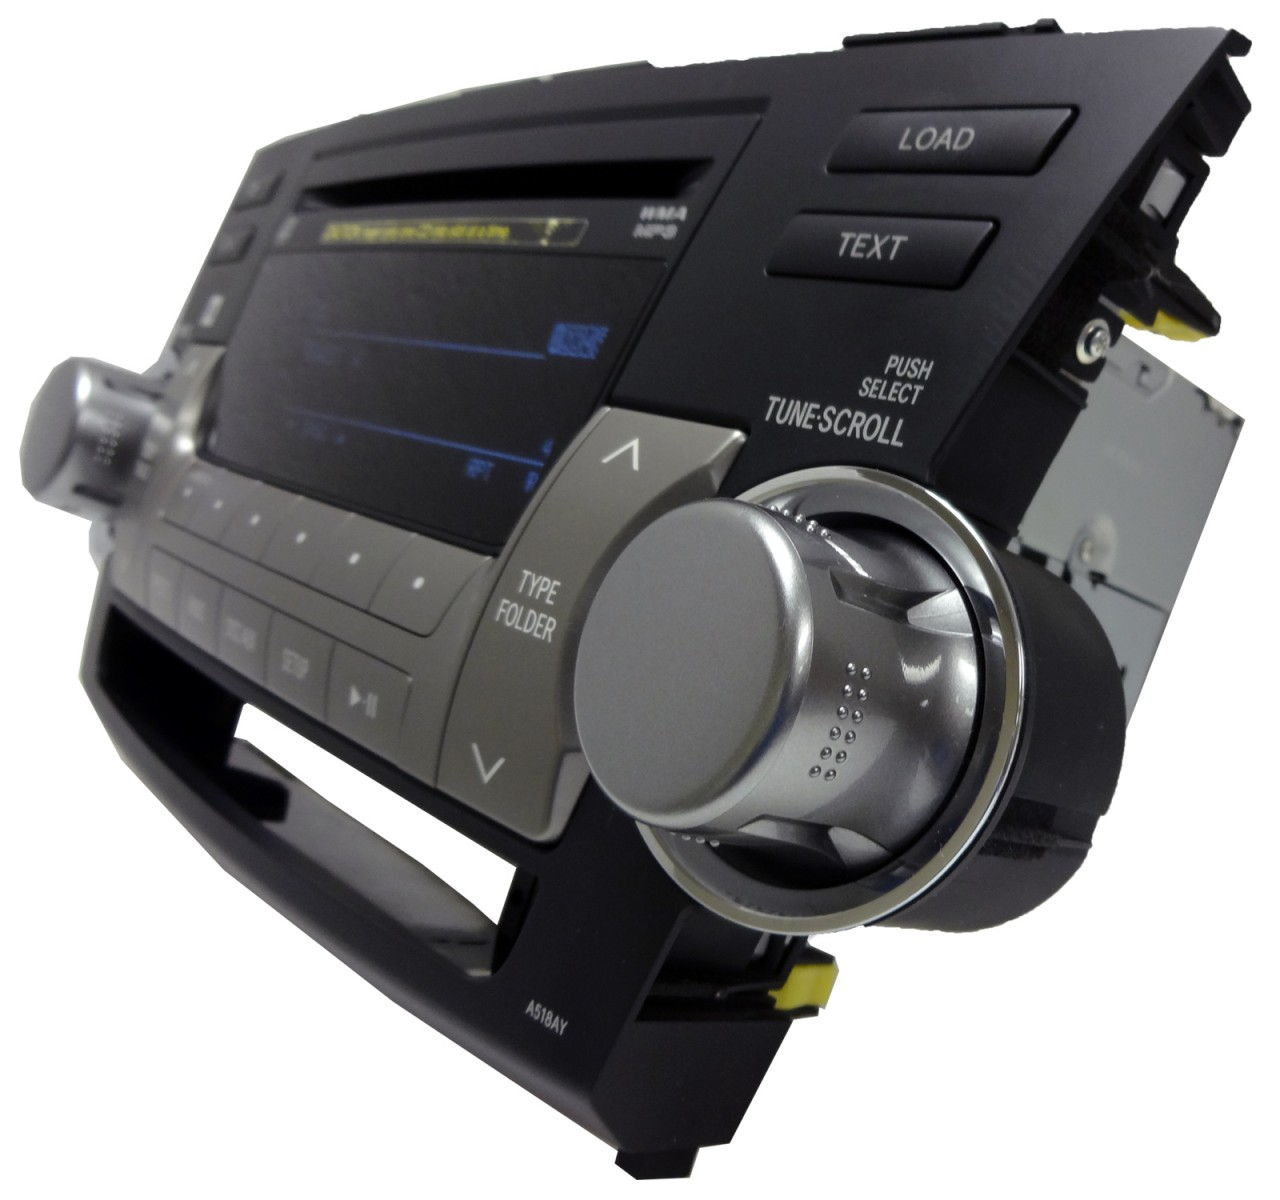 Toyota Highlander Used Mn: TOYOTA Highlander JBL Radio 6 Disc Changer MP3 CD Player